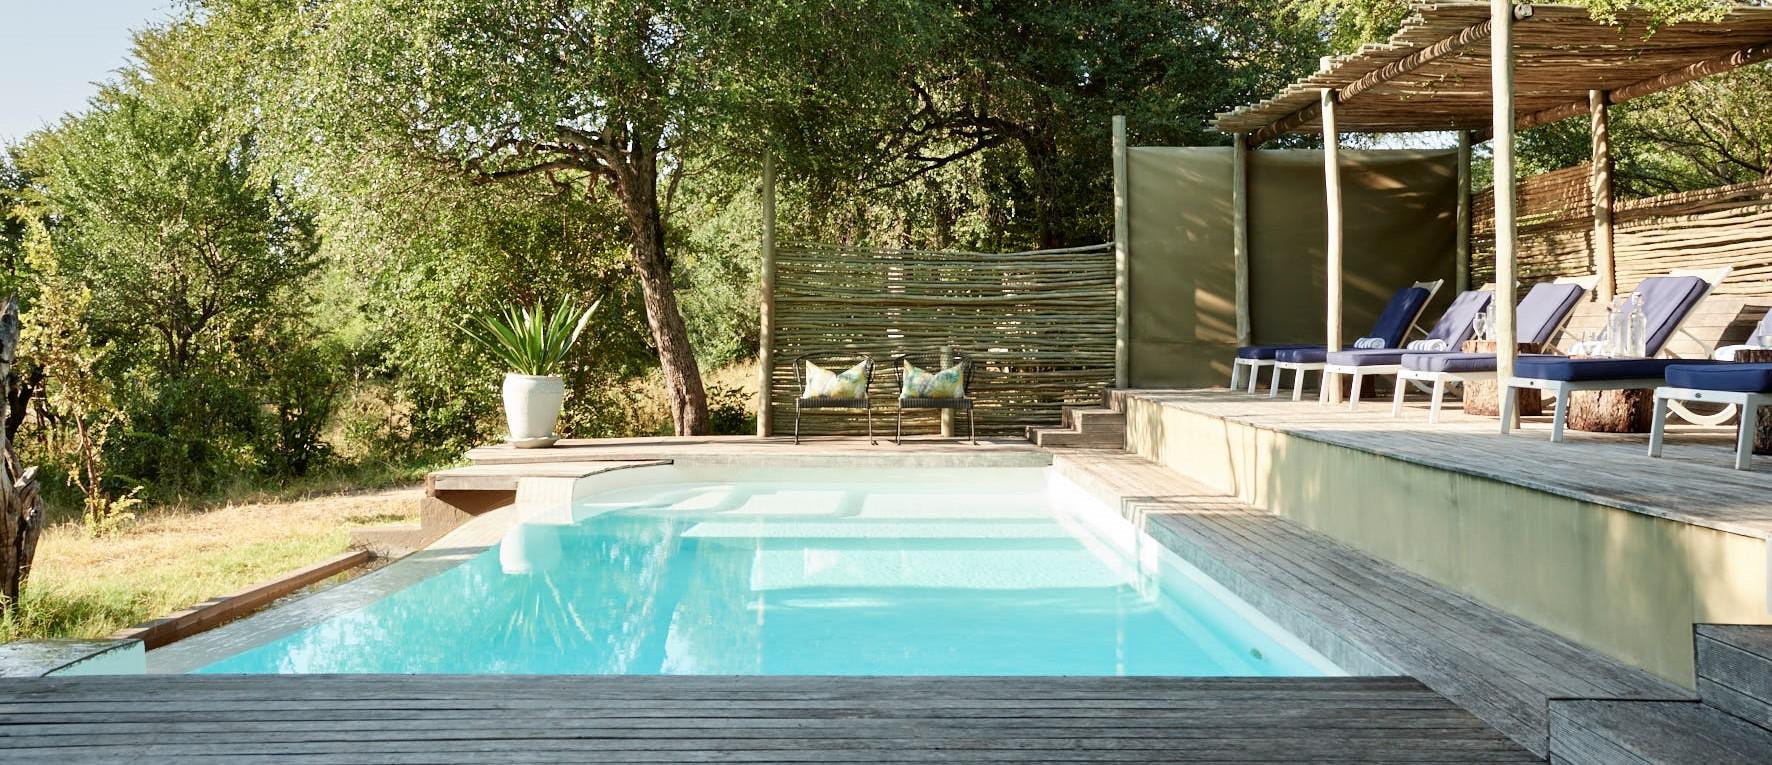 victoria-falls-river-lodge-swimming-pool